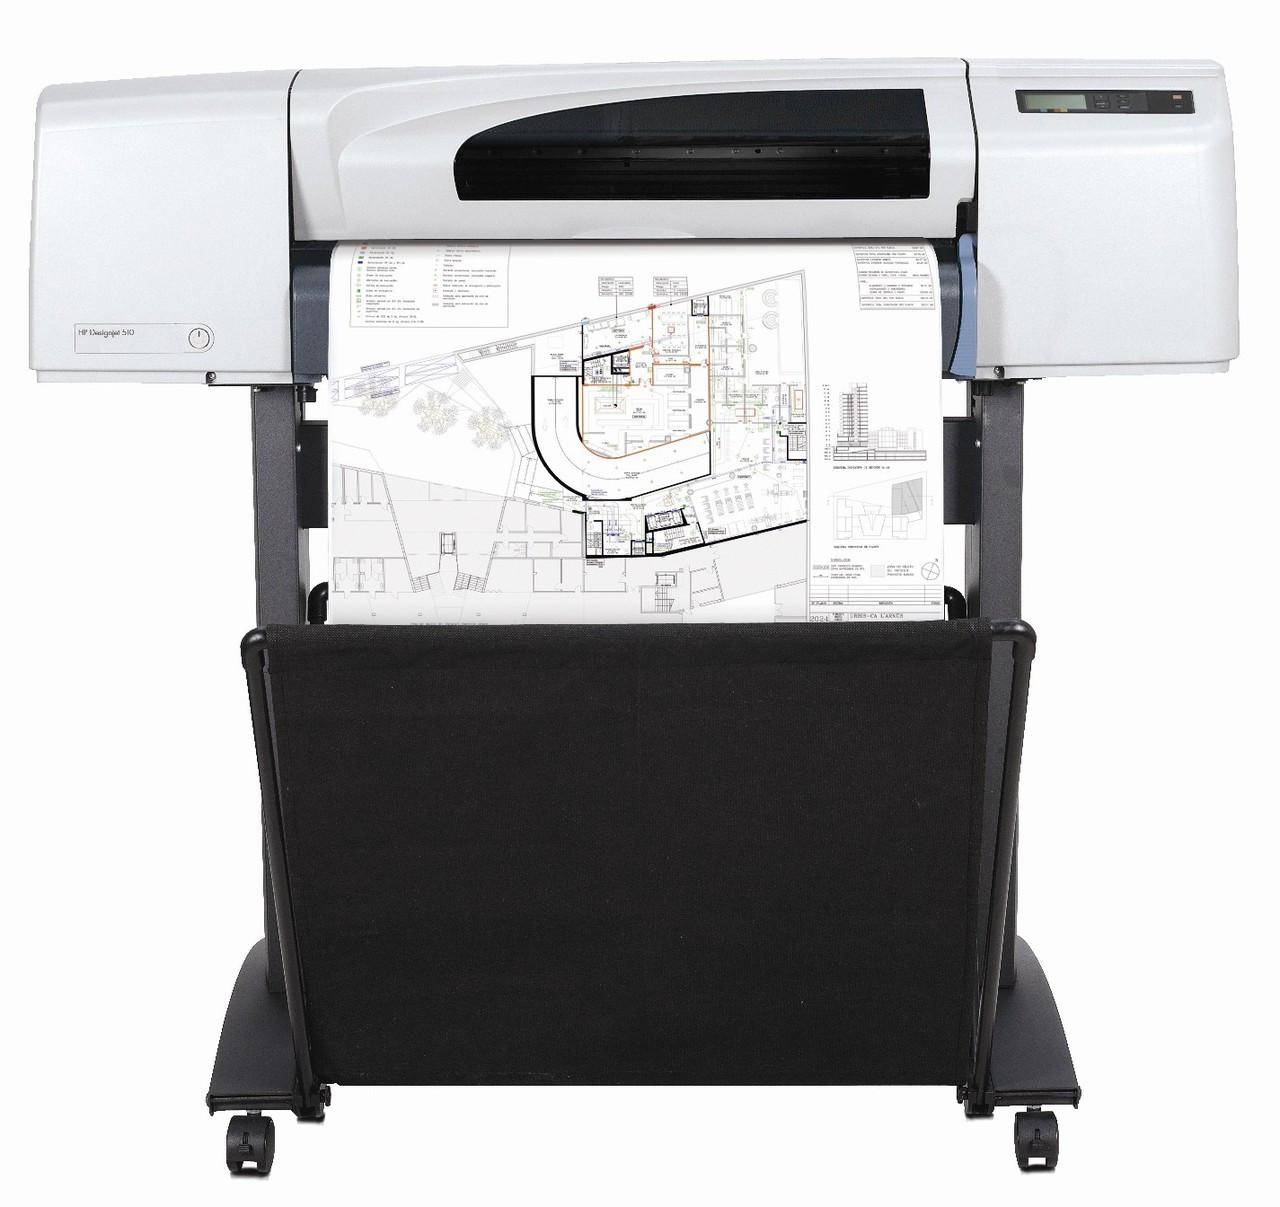 HP DesignJet 510 - CH337A - HP Plotter for Sale